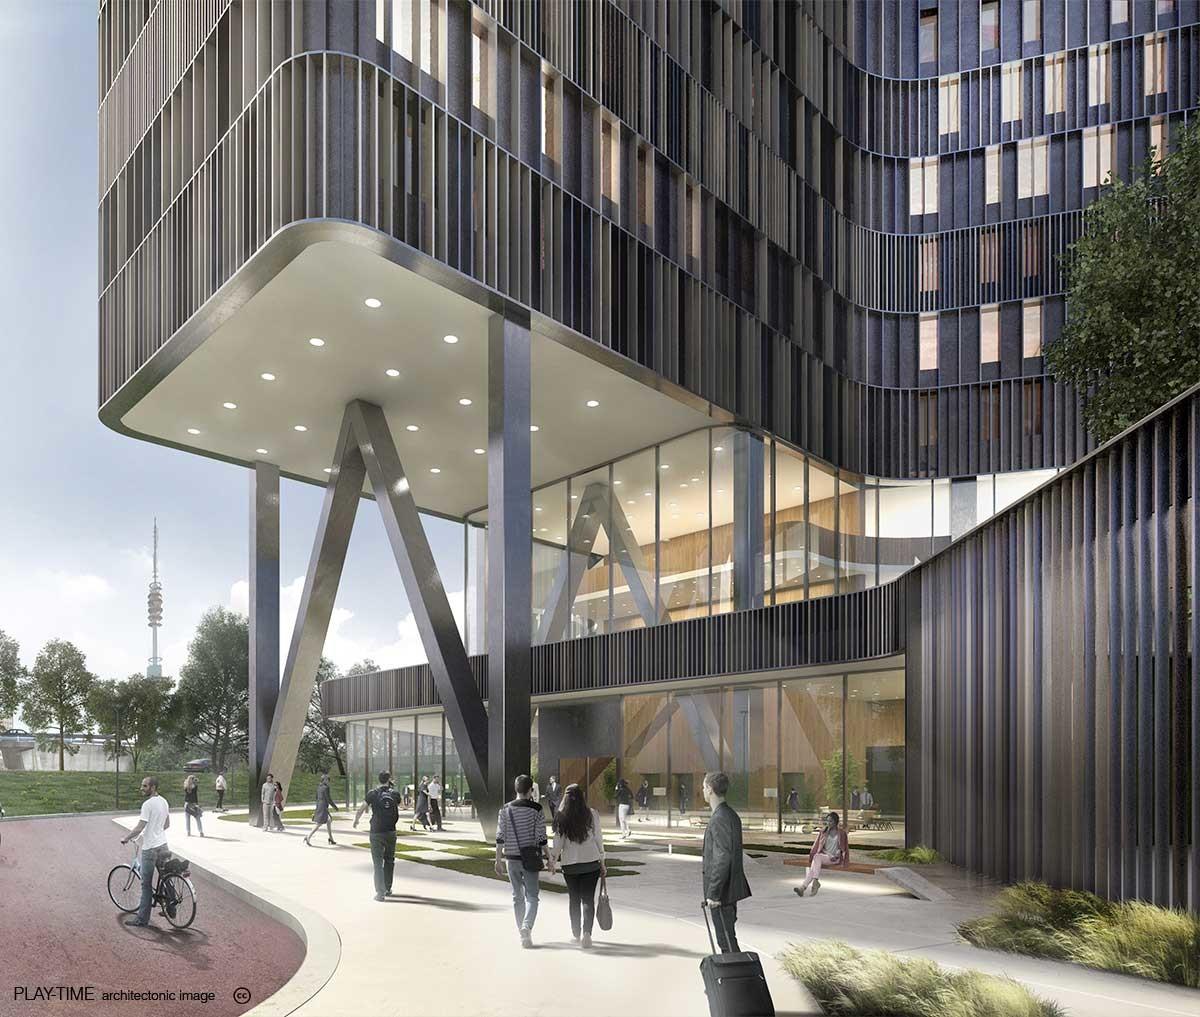 Play time architectonic image mecanoo amsterdam rai hotel 02